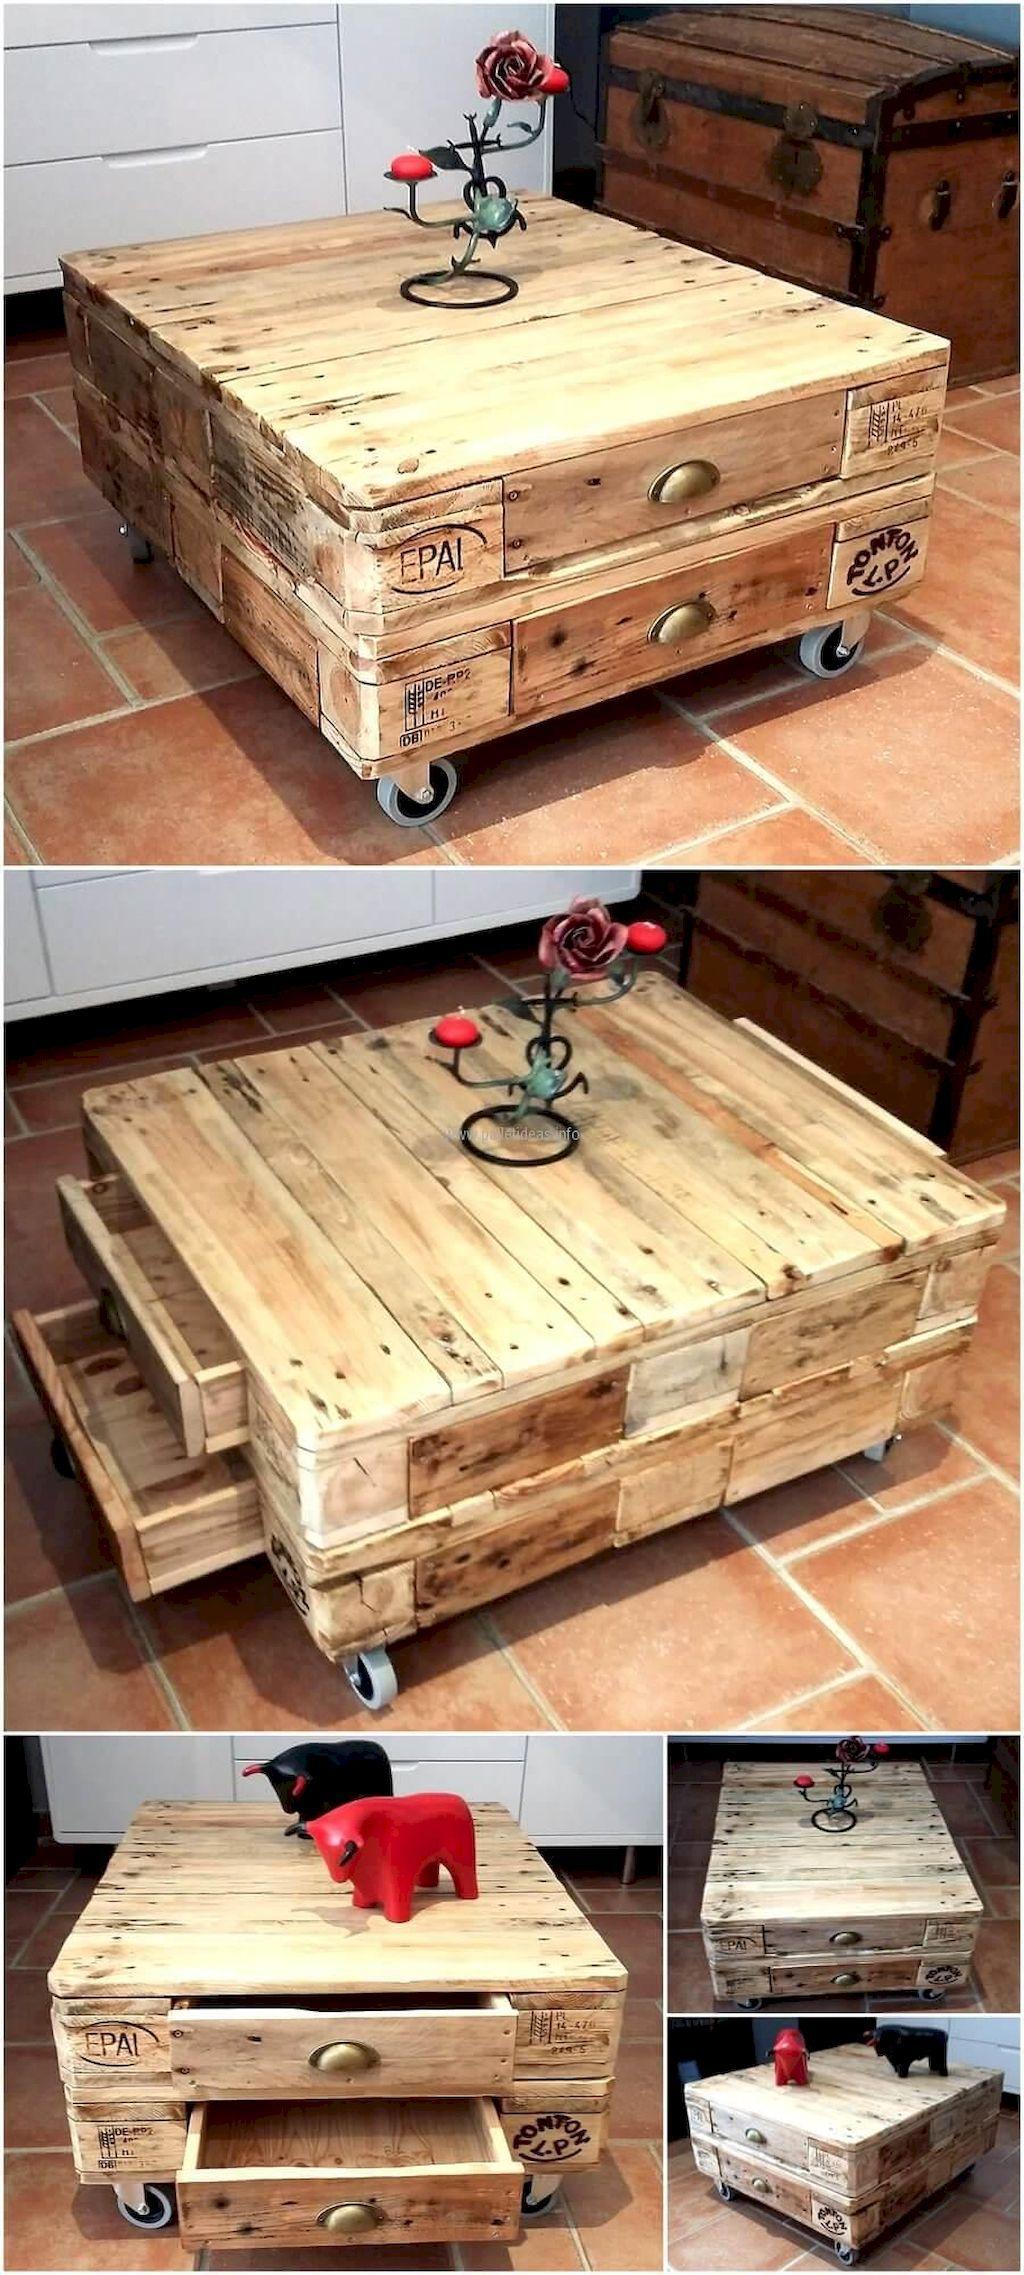 60 Creative DIY Wodden Pallet Furniture Projects